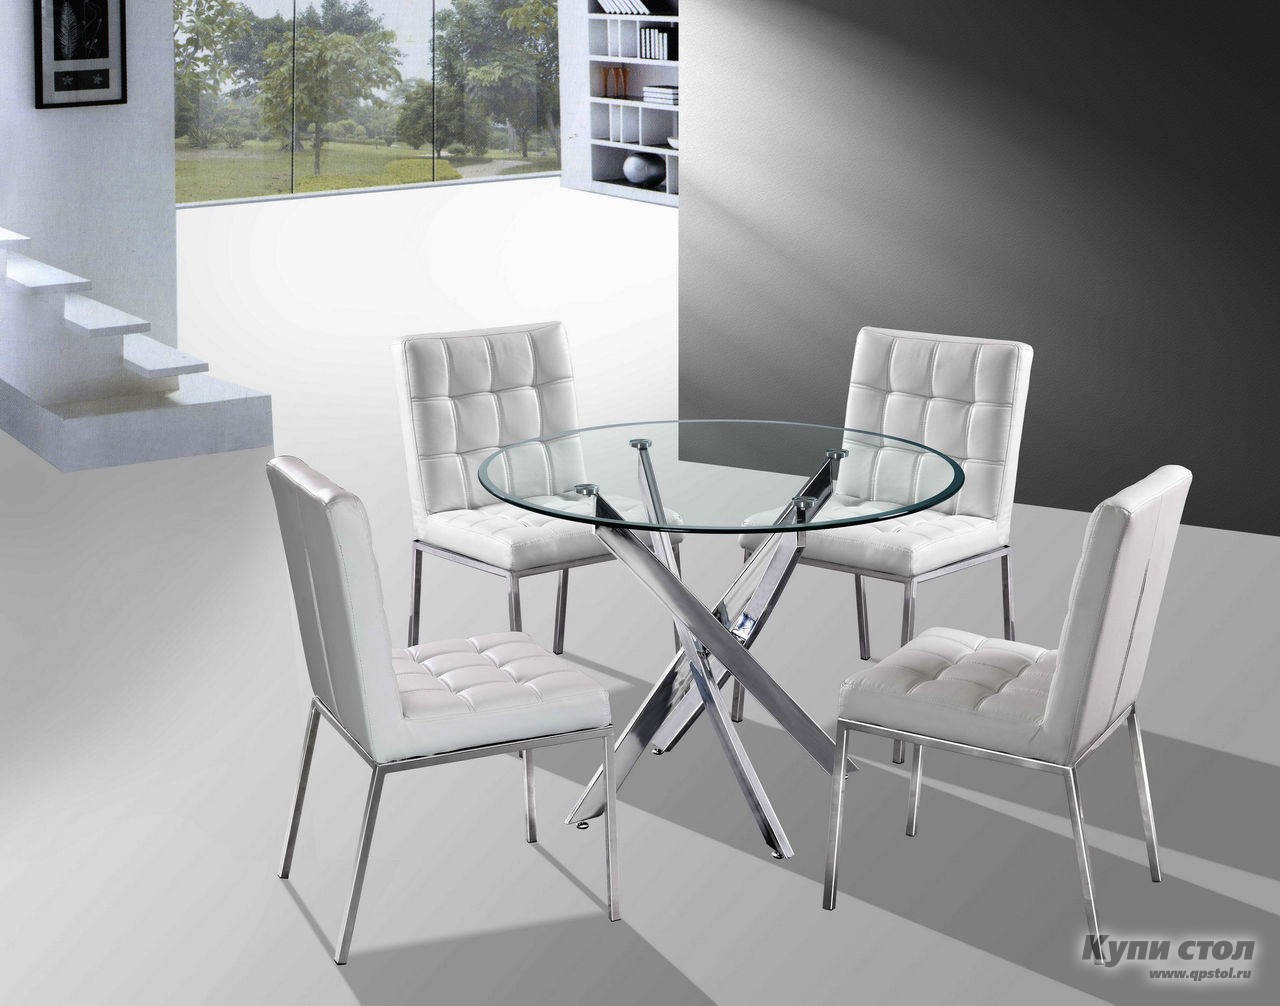 Обеденный стол Eleganza DT-801 КупиСтол.Ru 9900.000